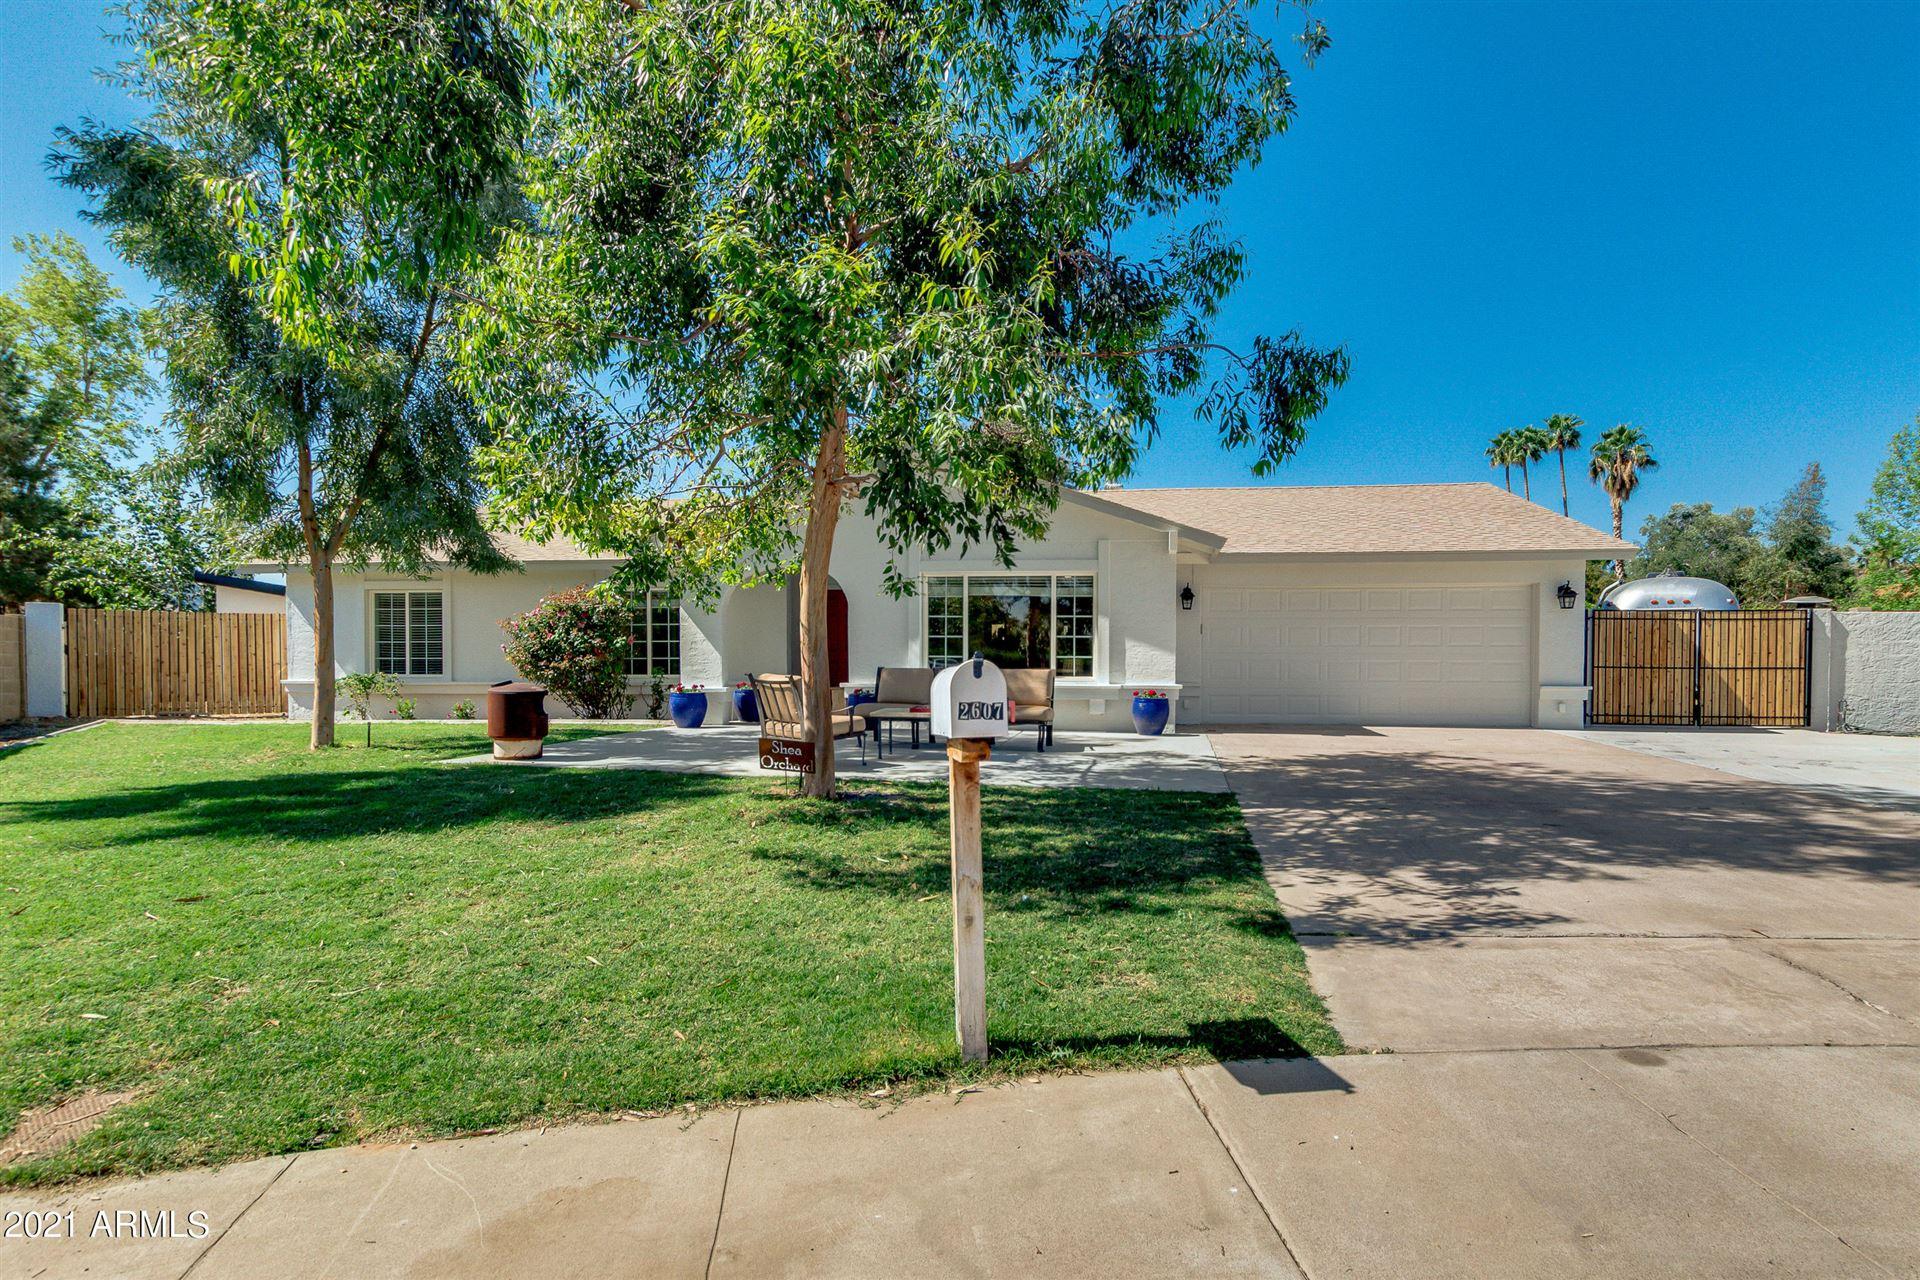 2607 E MERCER Lane, Phoenix, AZ 85028 - MLS#: 6221616